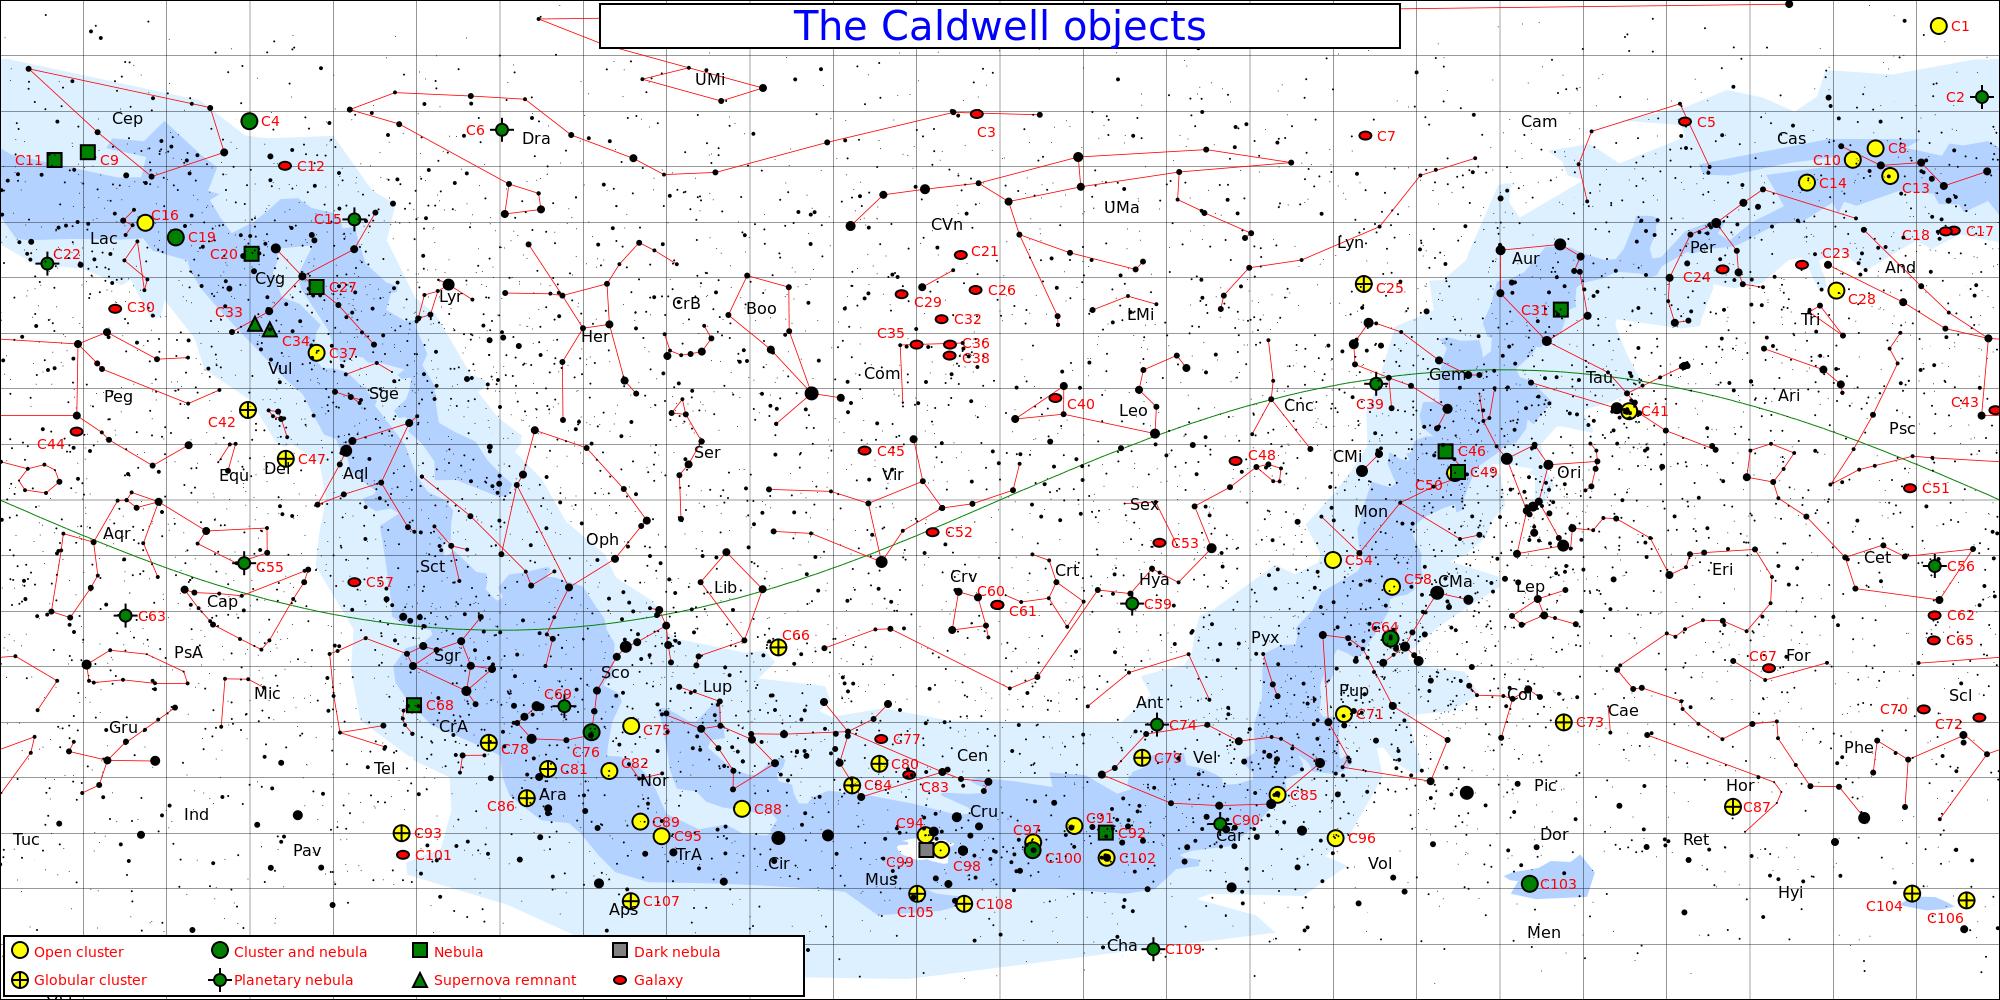 CaldwellStarChart-2000px